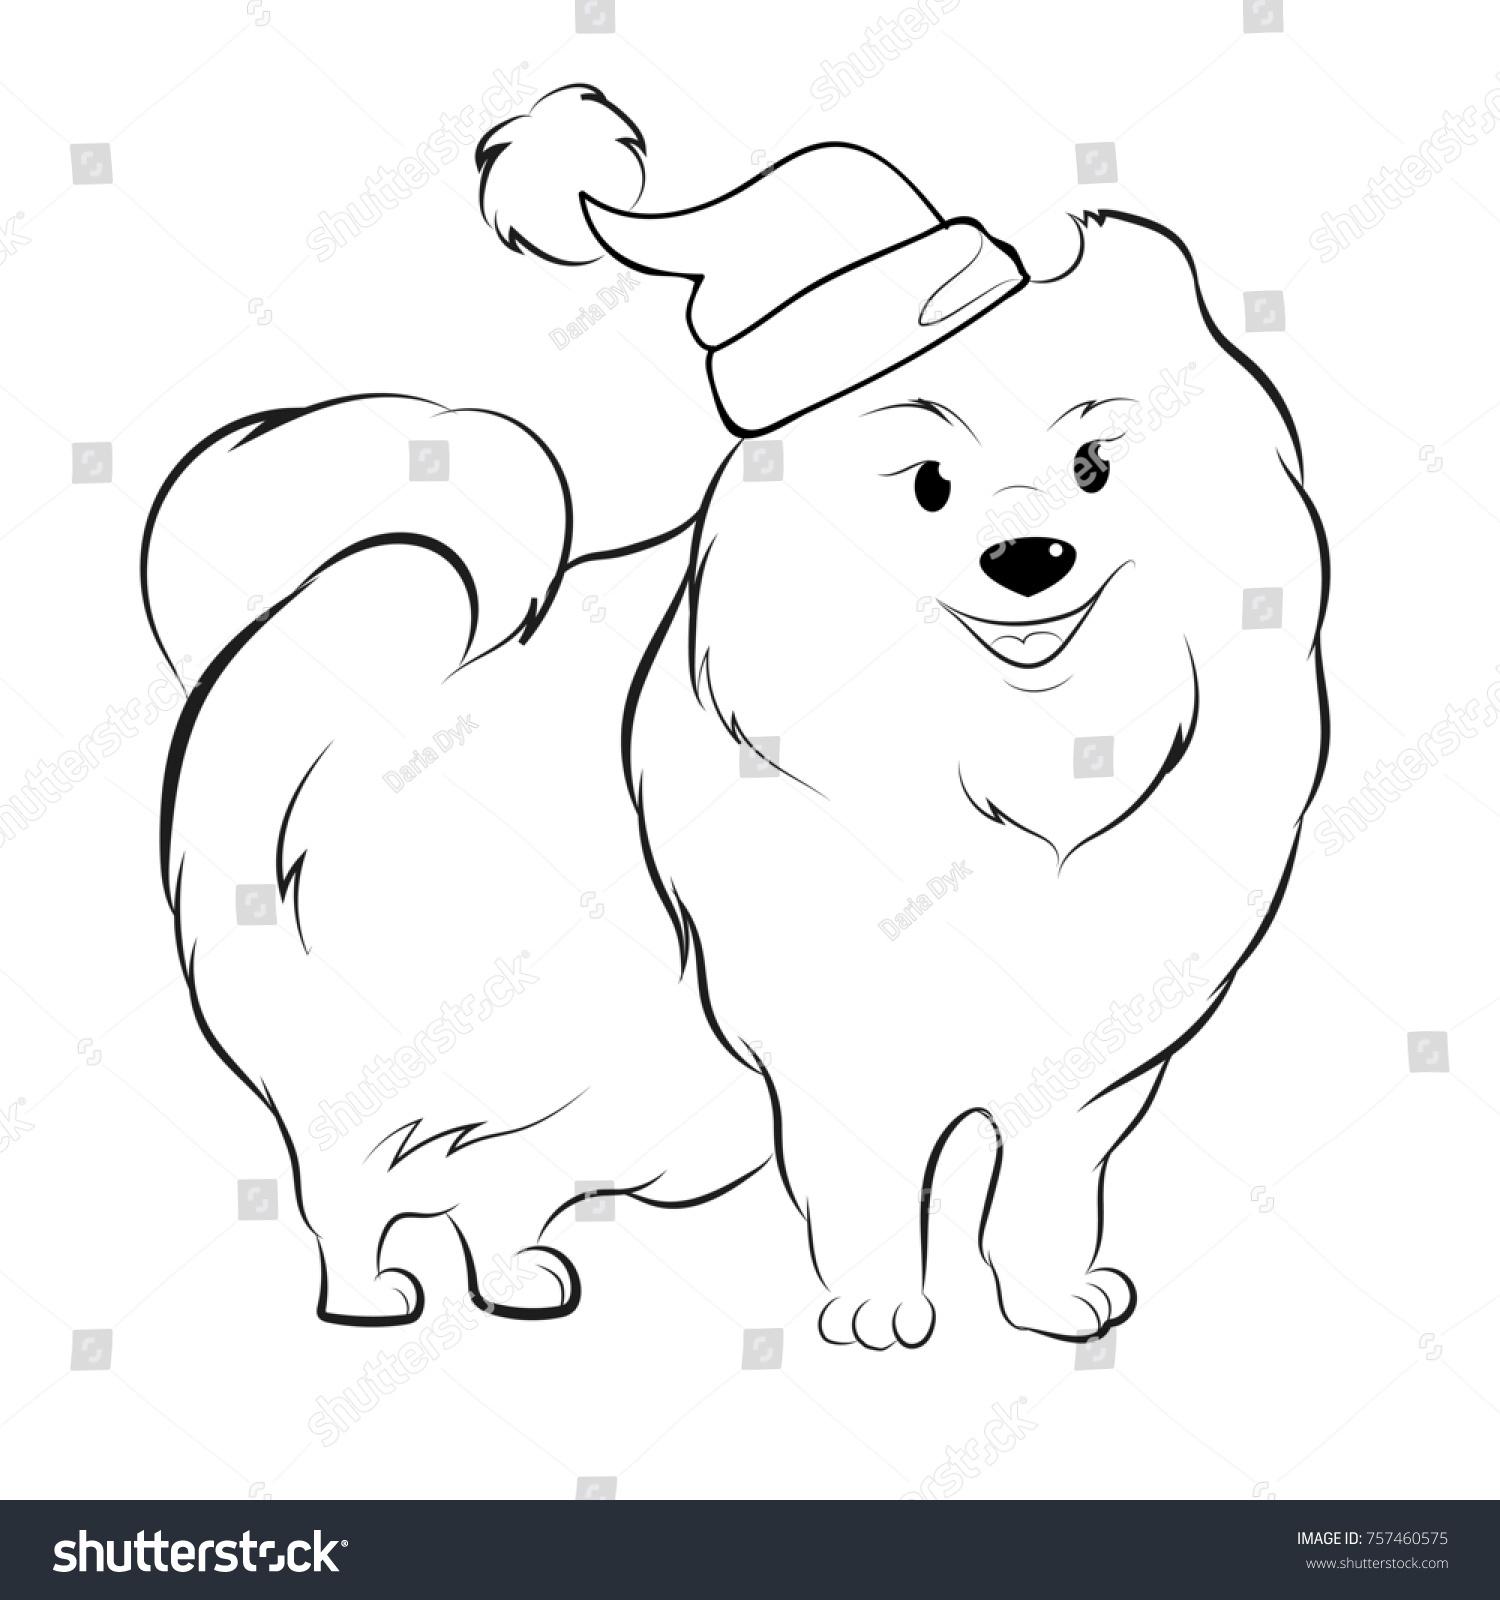 Dog Santa Coloring Page Stock Illustration 757460575 - Shutterstock